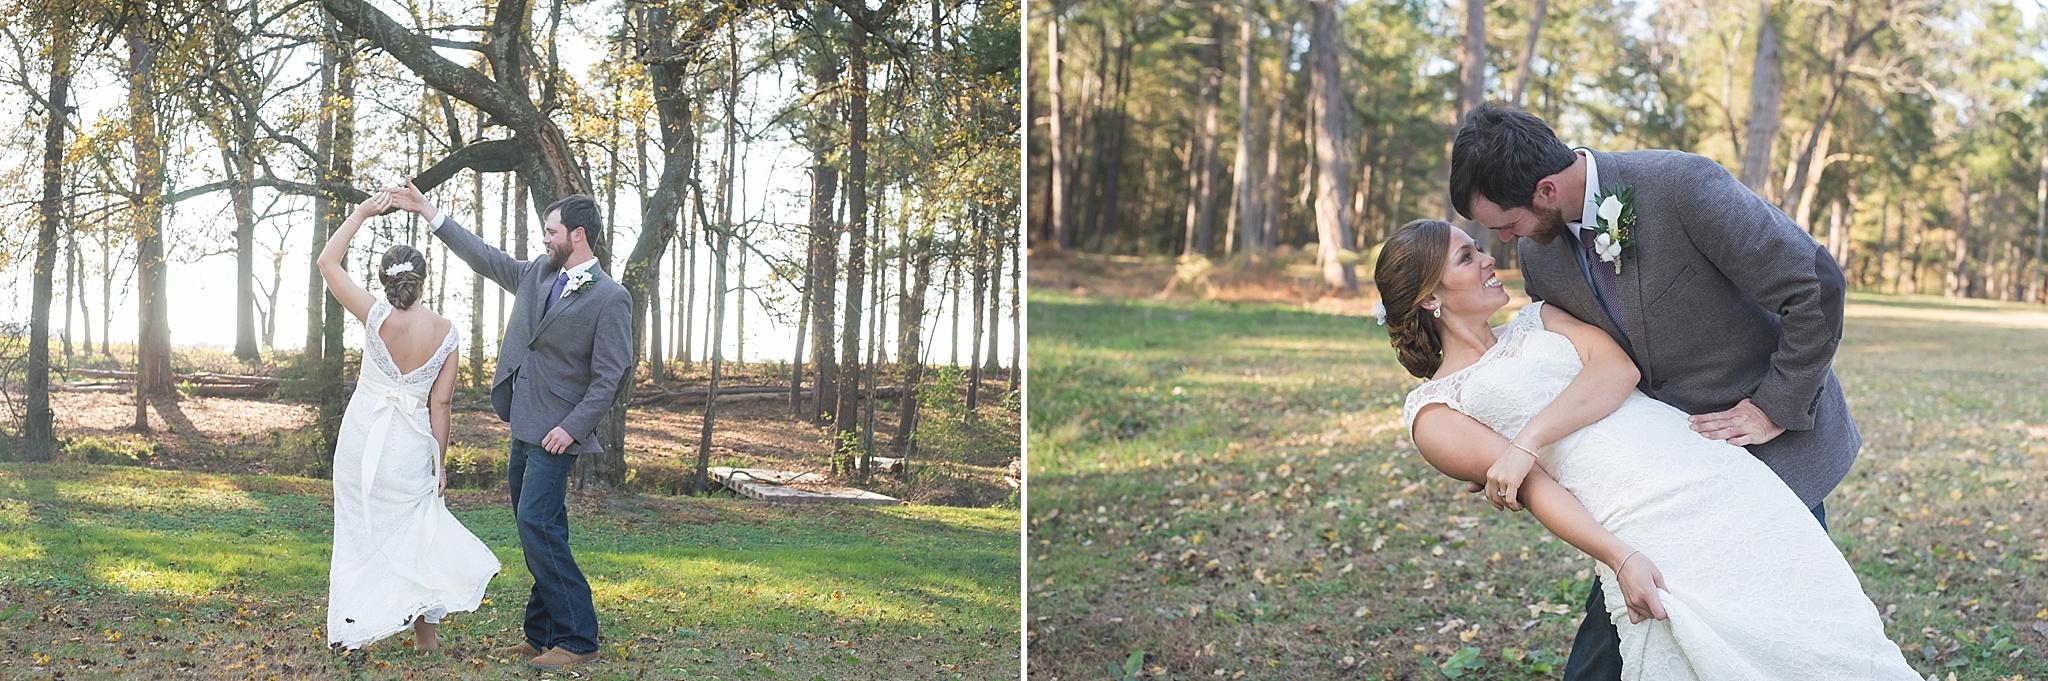 May-Lew-Farm-Farmville-NC-Wedding-Photographer-084.jpg